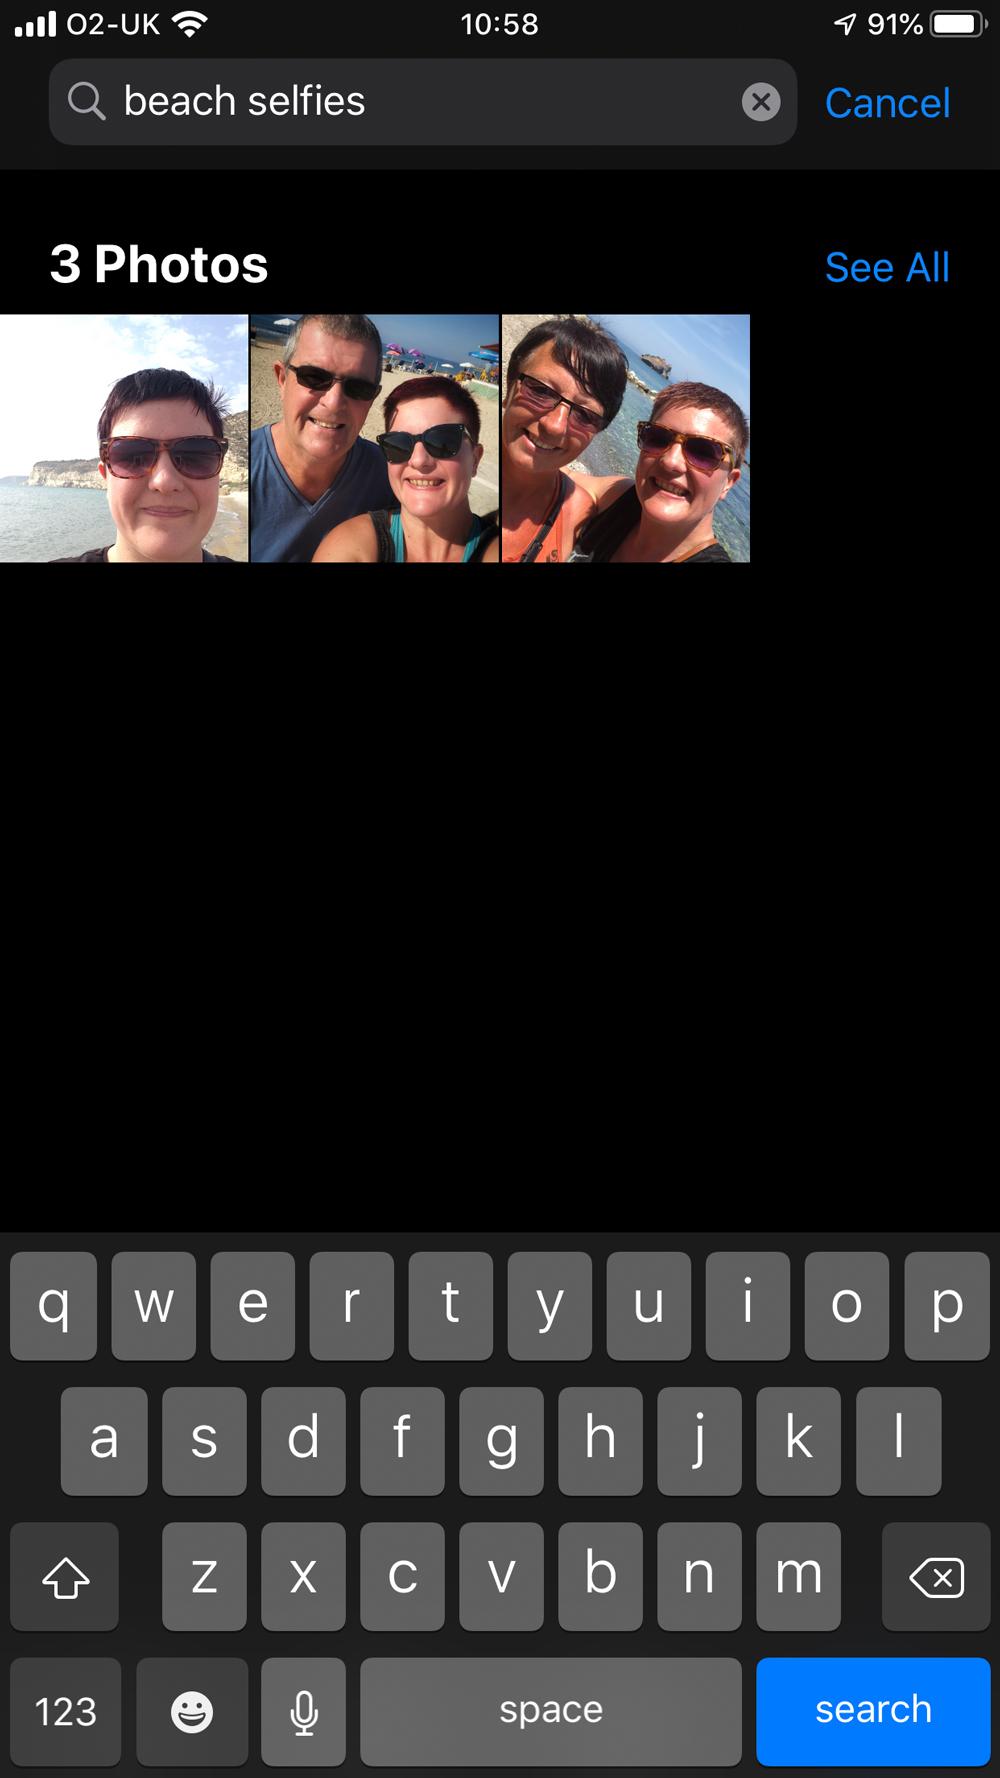 iOS 13 Camera App Search Function